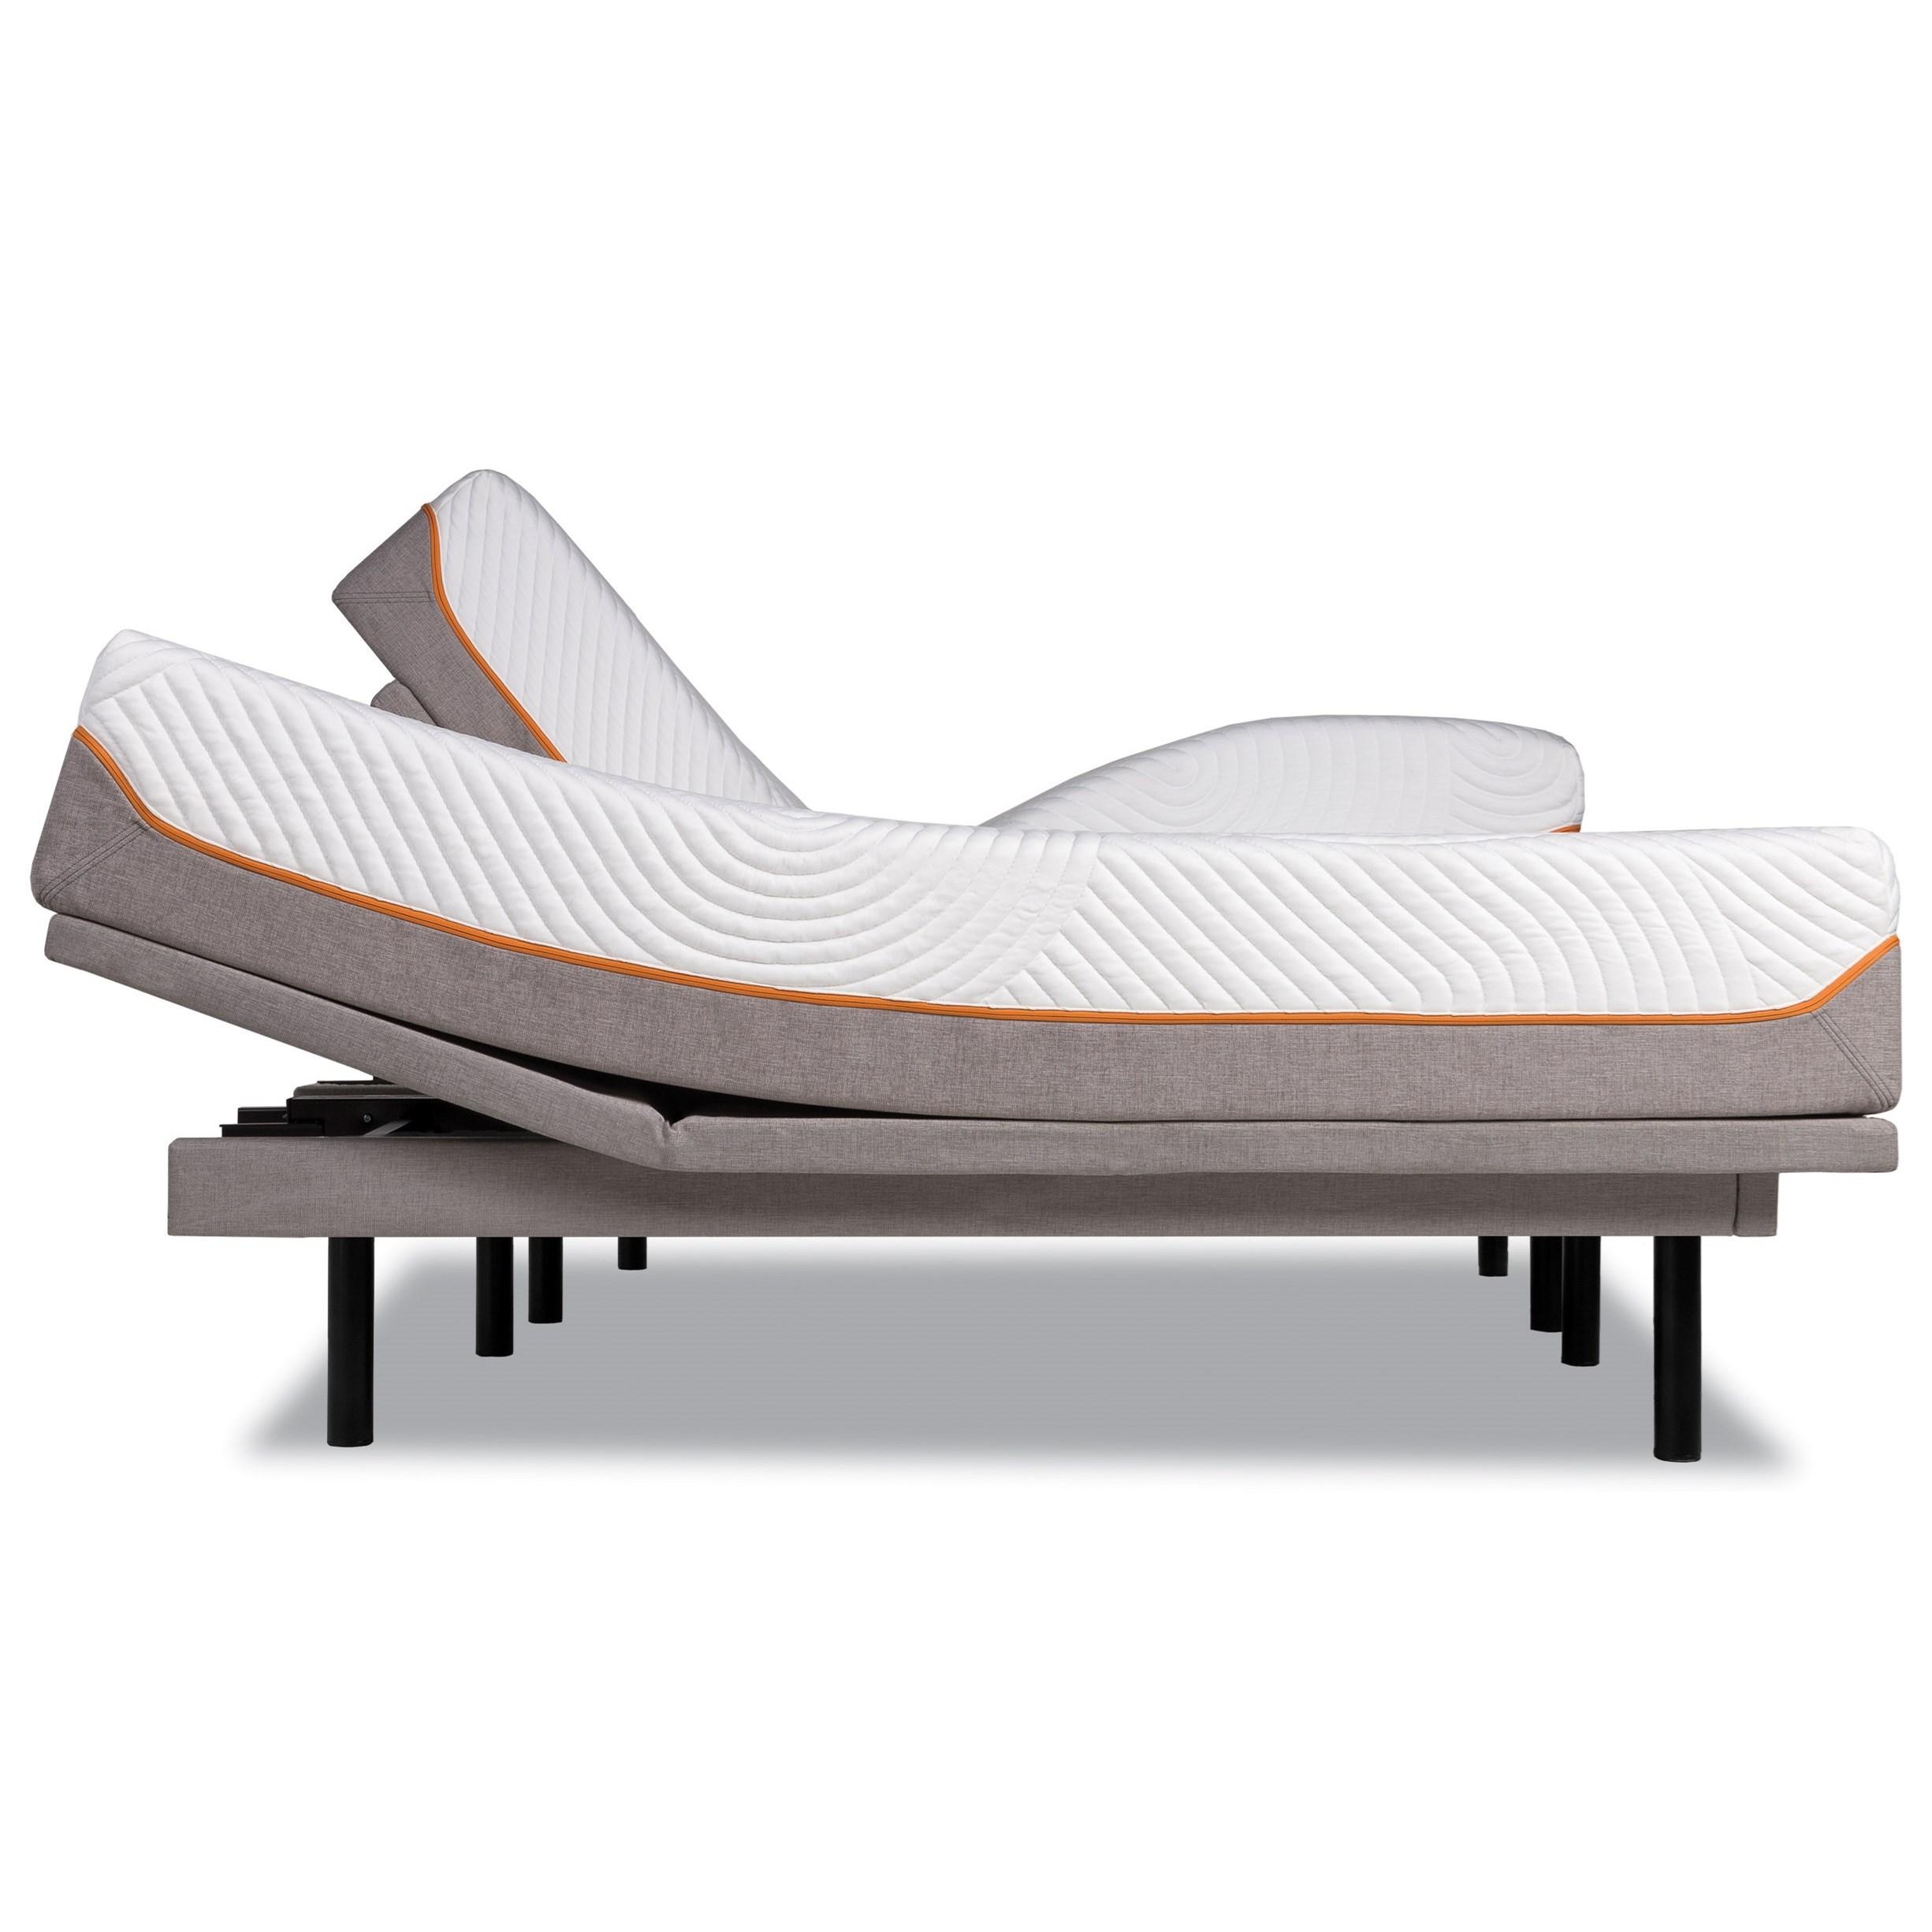 Tempur-Pedic® TEMPUR-Contour Supreme Cal King Firm Mattress Set - Item Number: 10256180+2x25289290